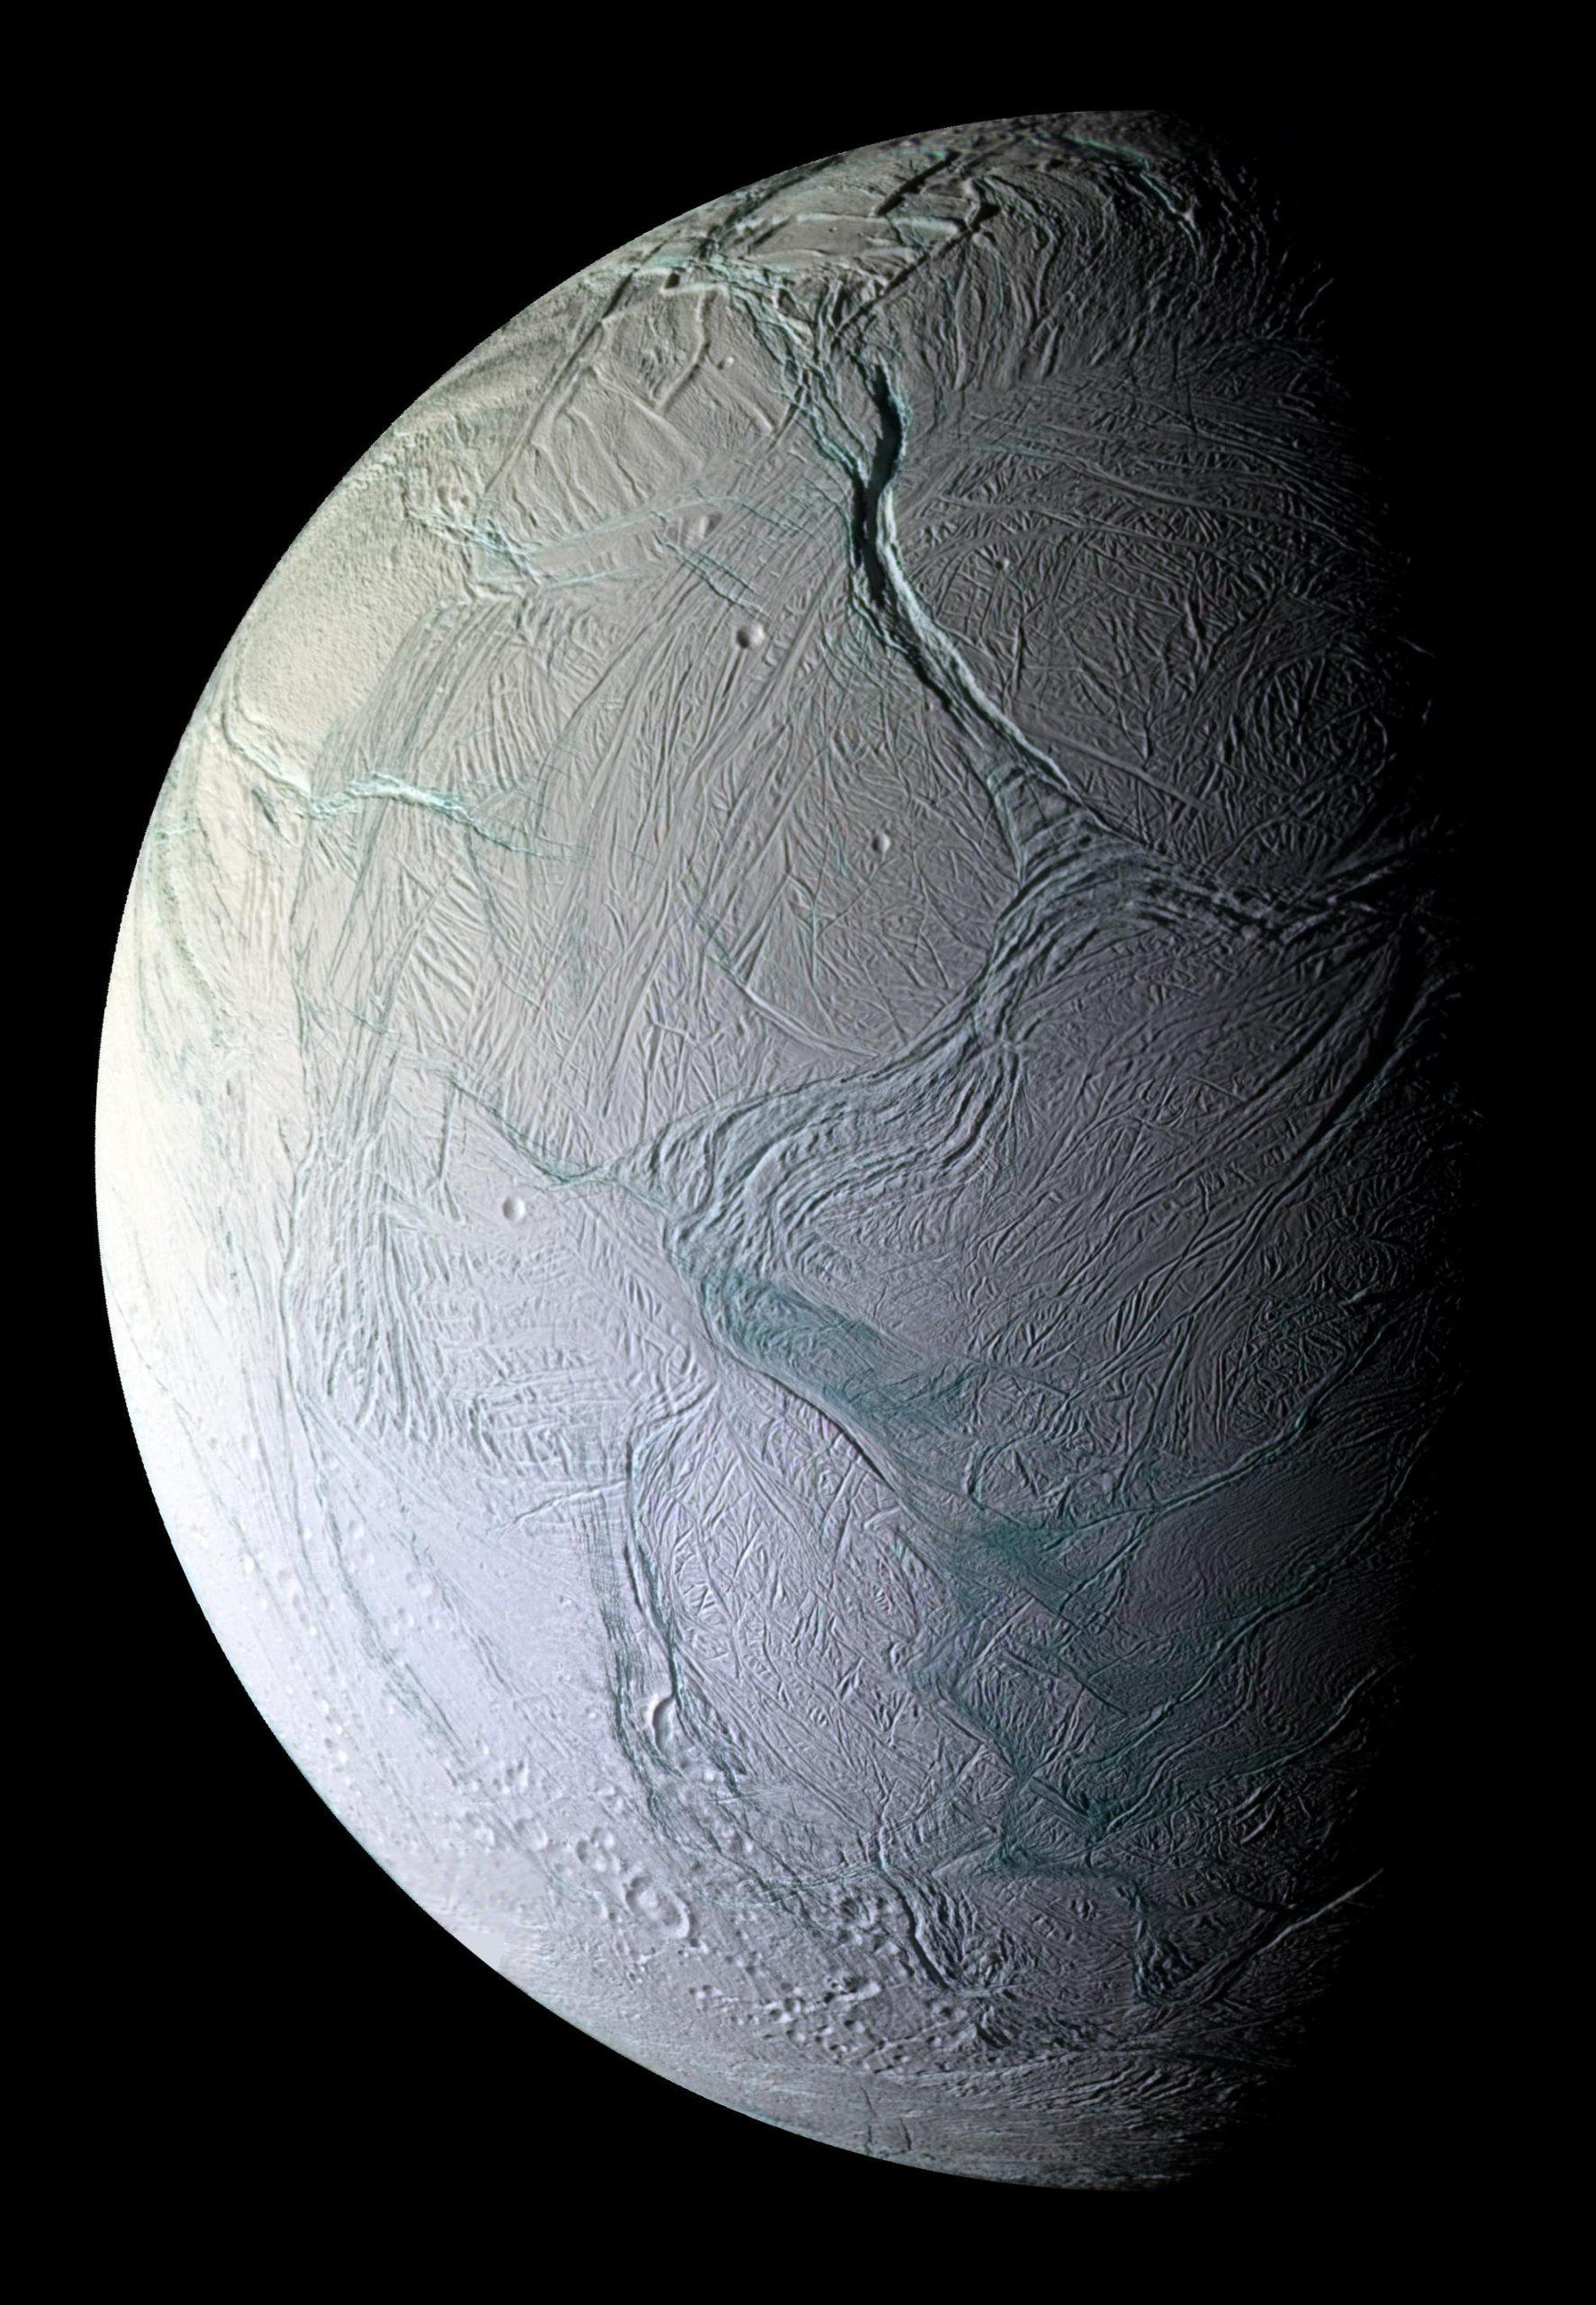 satürn uydusu satürn'ün uydusu enceladus